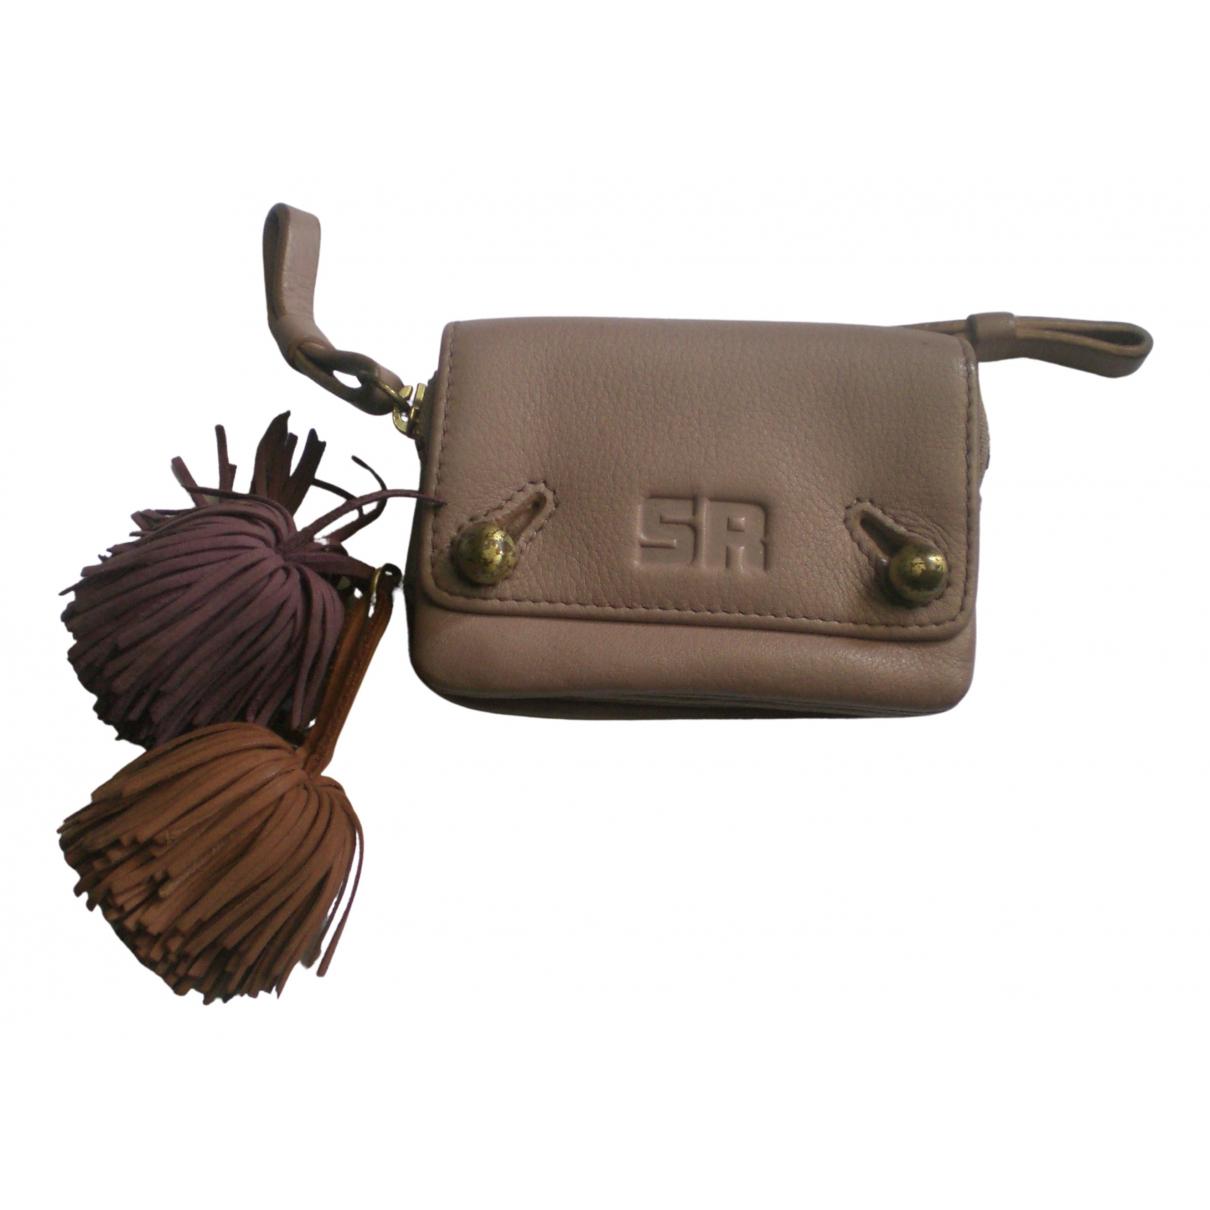 Sonia Rykiel - Petite maroquinerie   pour femme en cuir - violet